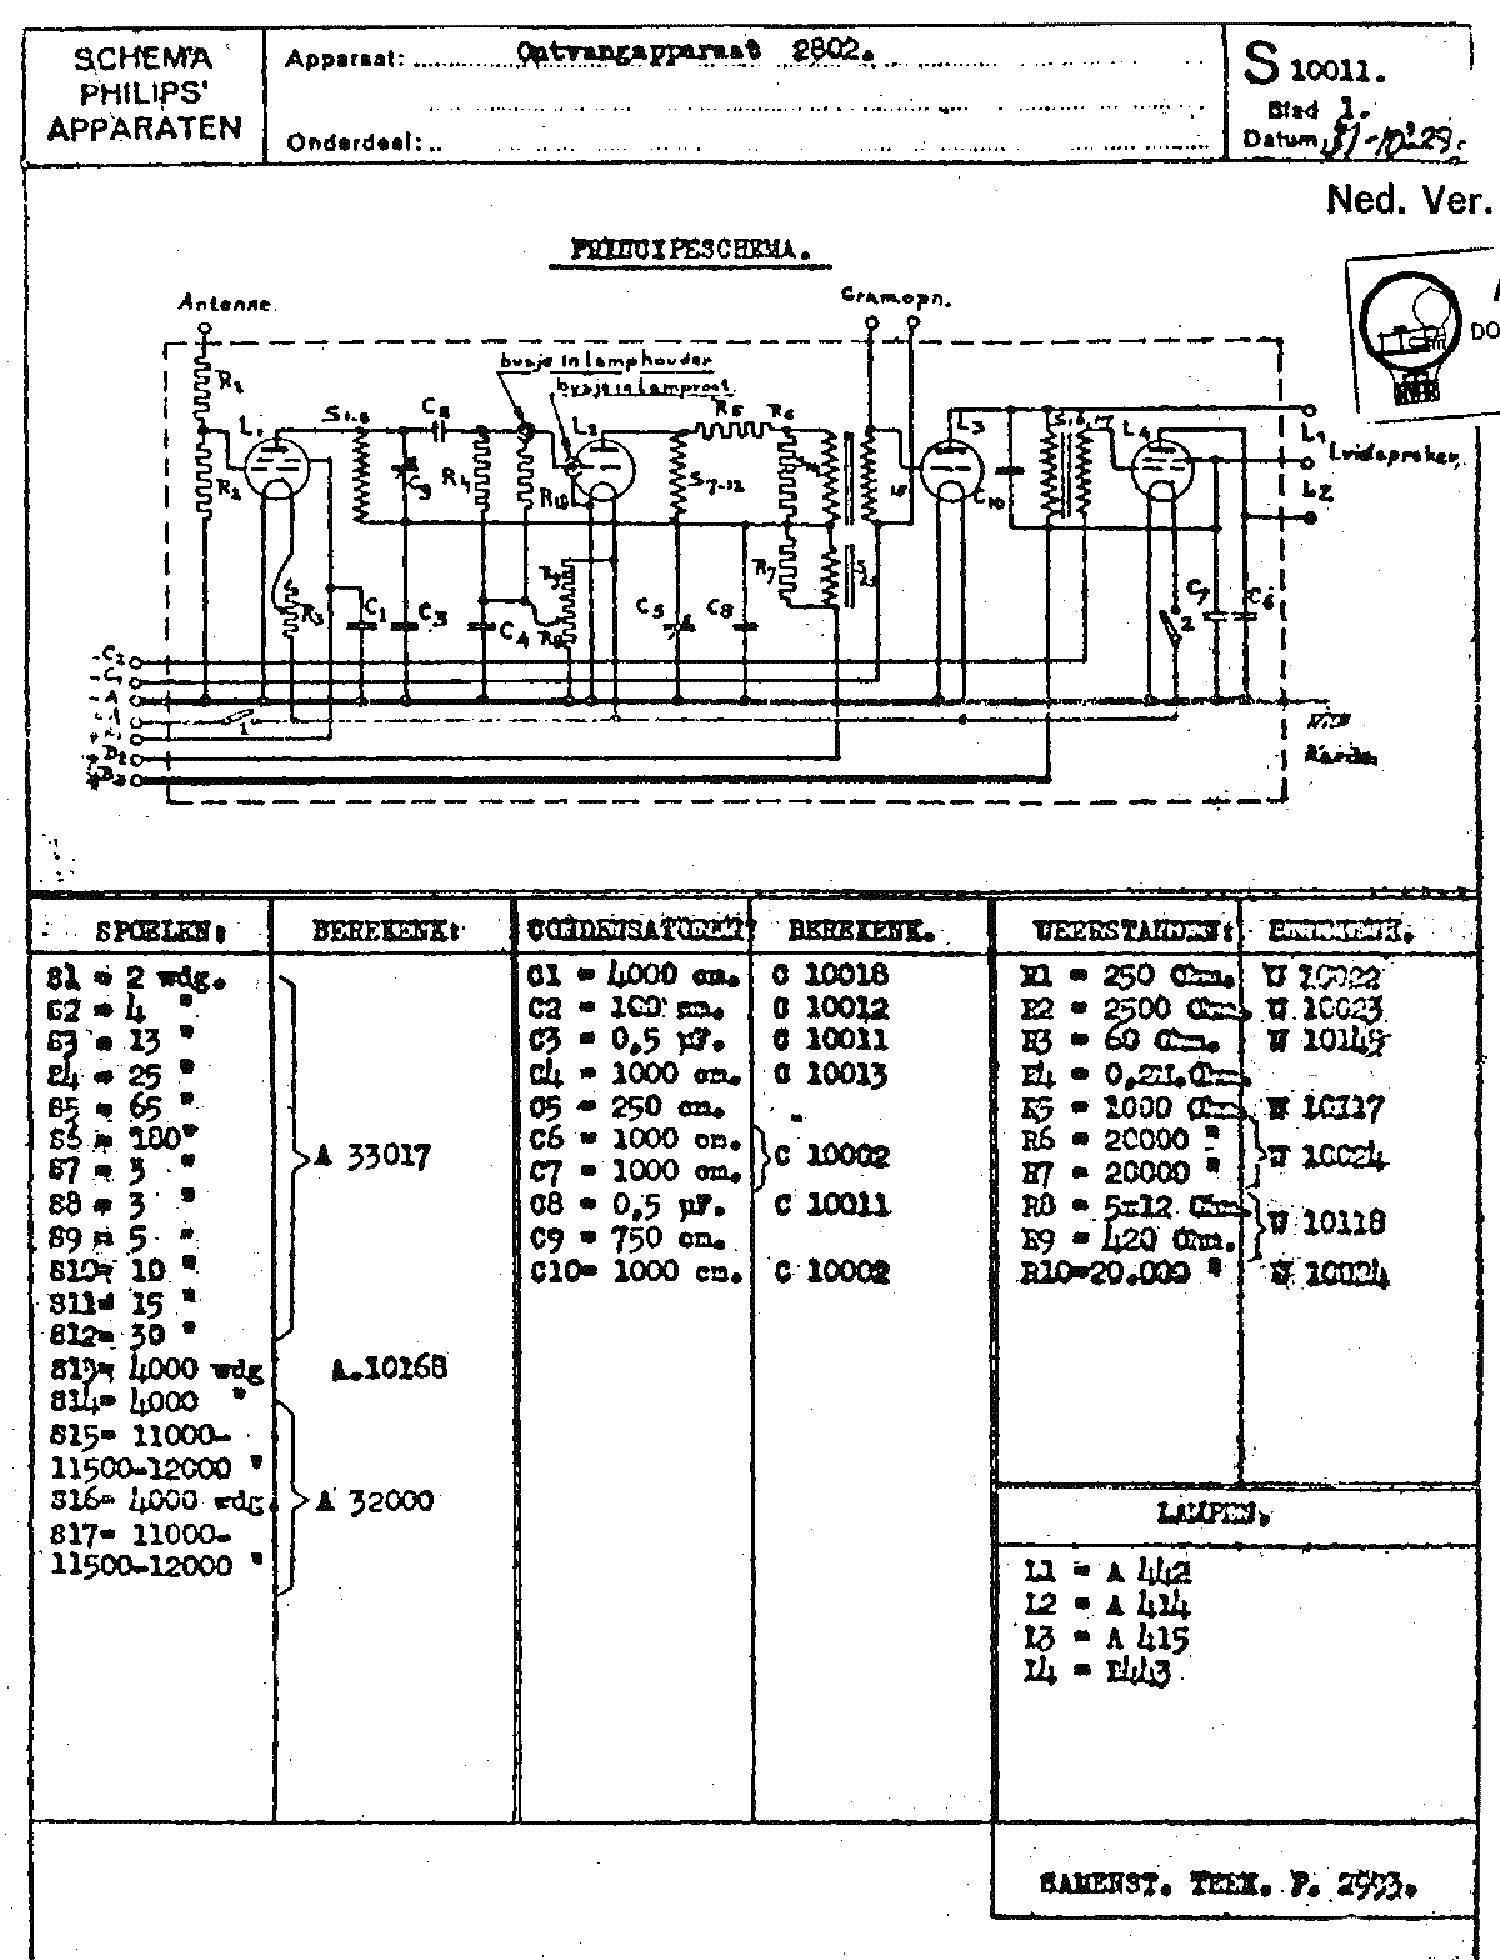 Mt103 202 Manual download receiver jig